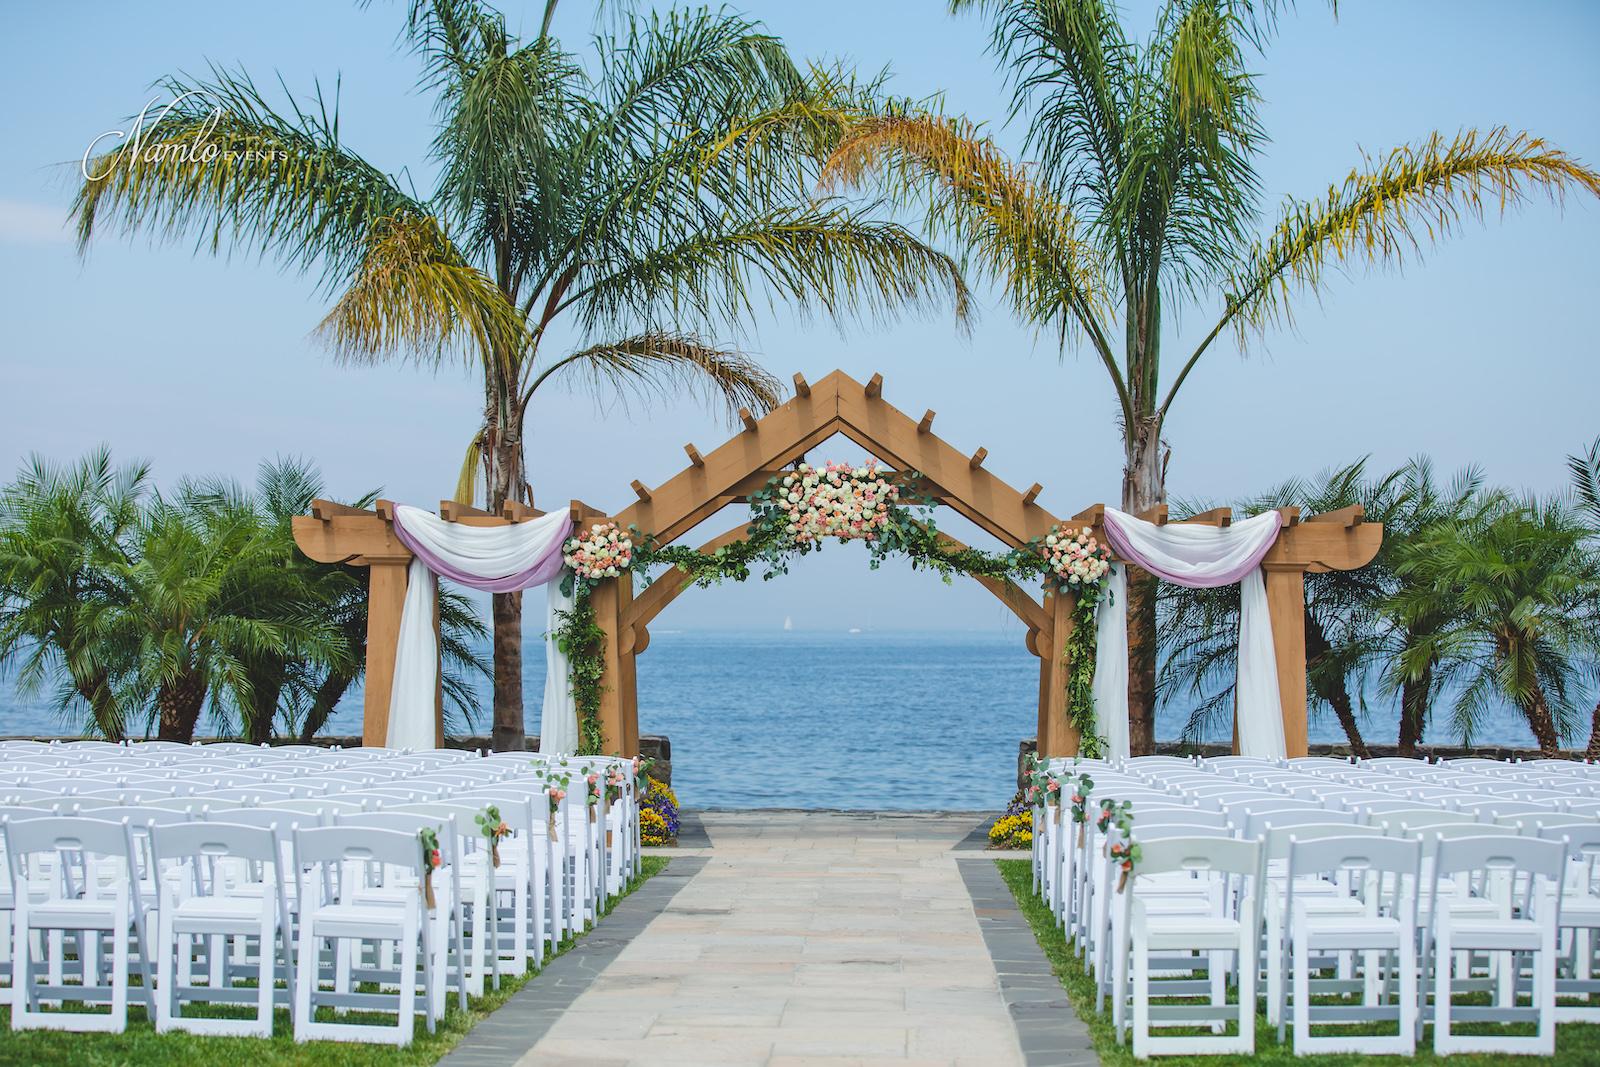 Bikrant Wedding